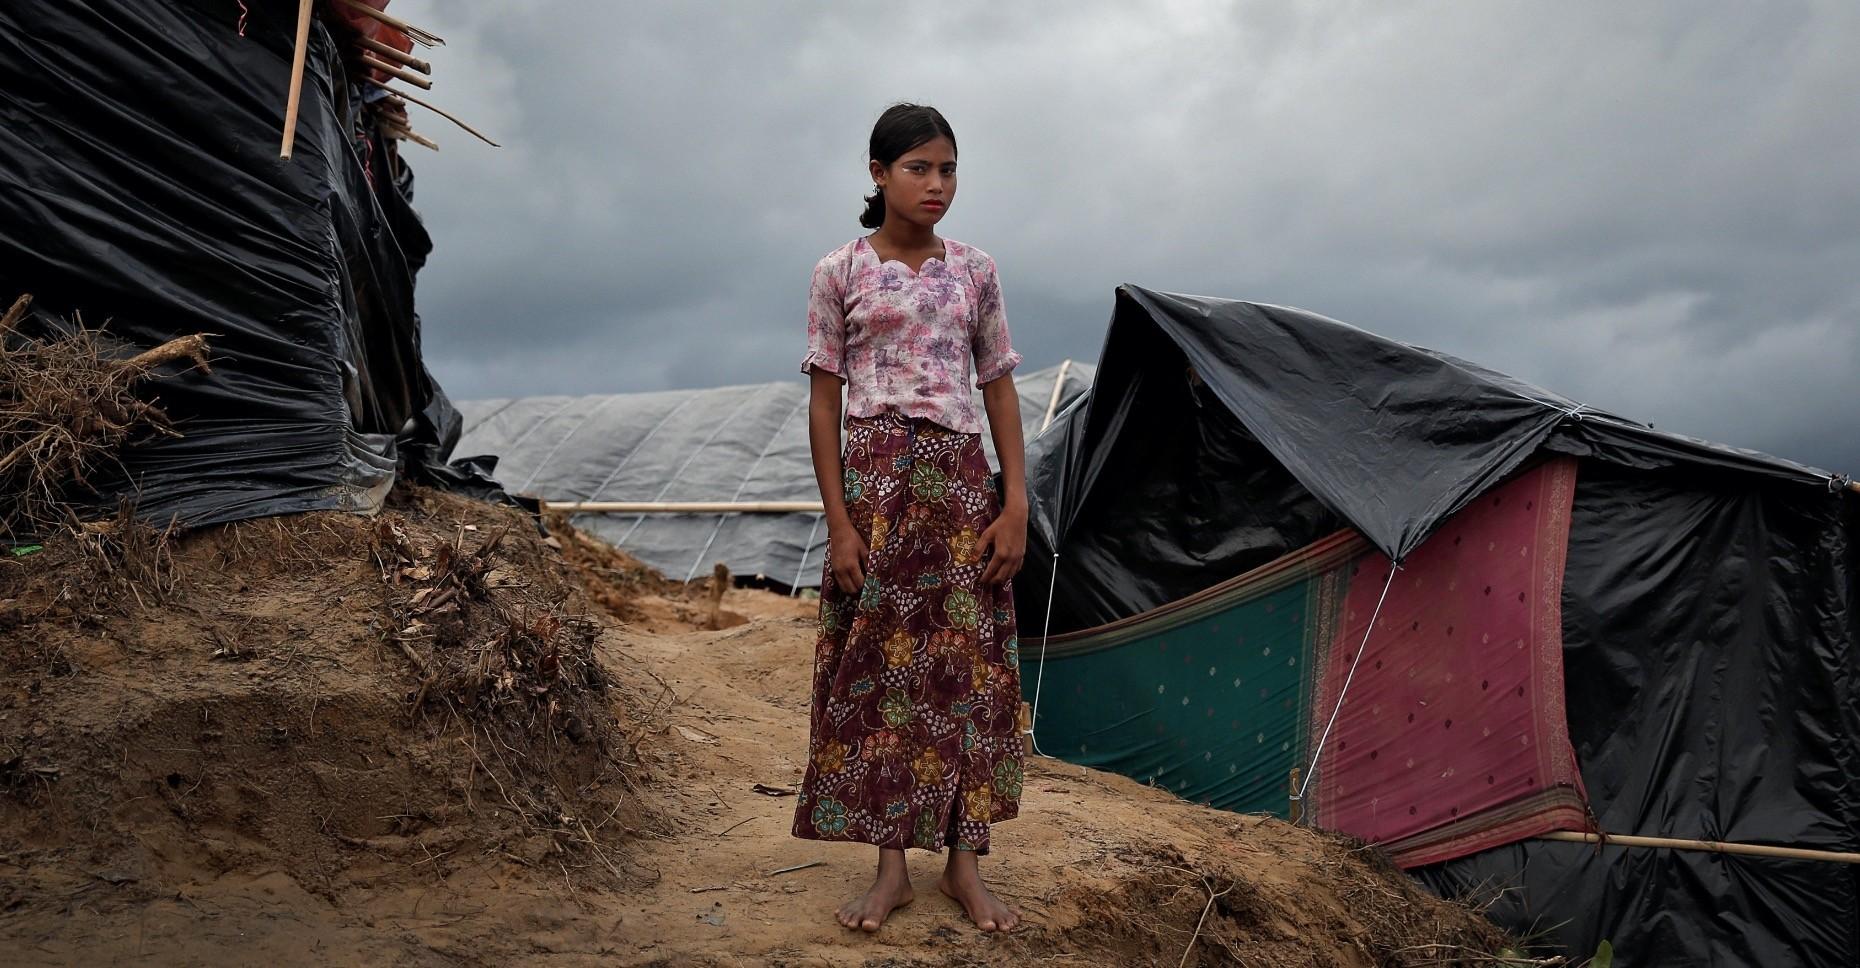 A Rohingya refugee girl poses in Coxu2019s Bazar, Sept. 28, 2017.